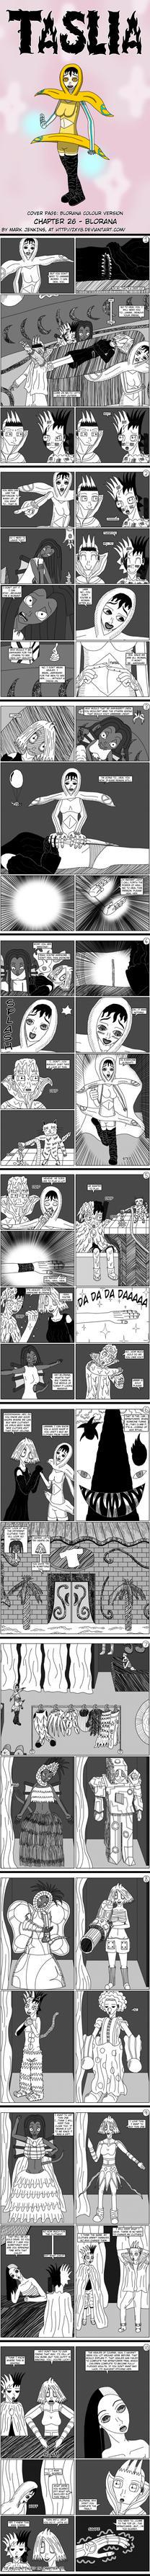 Taslia comic - Chapter 26, by ZXY8 by zxy8